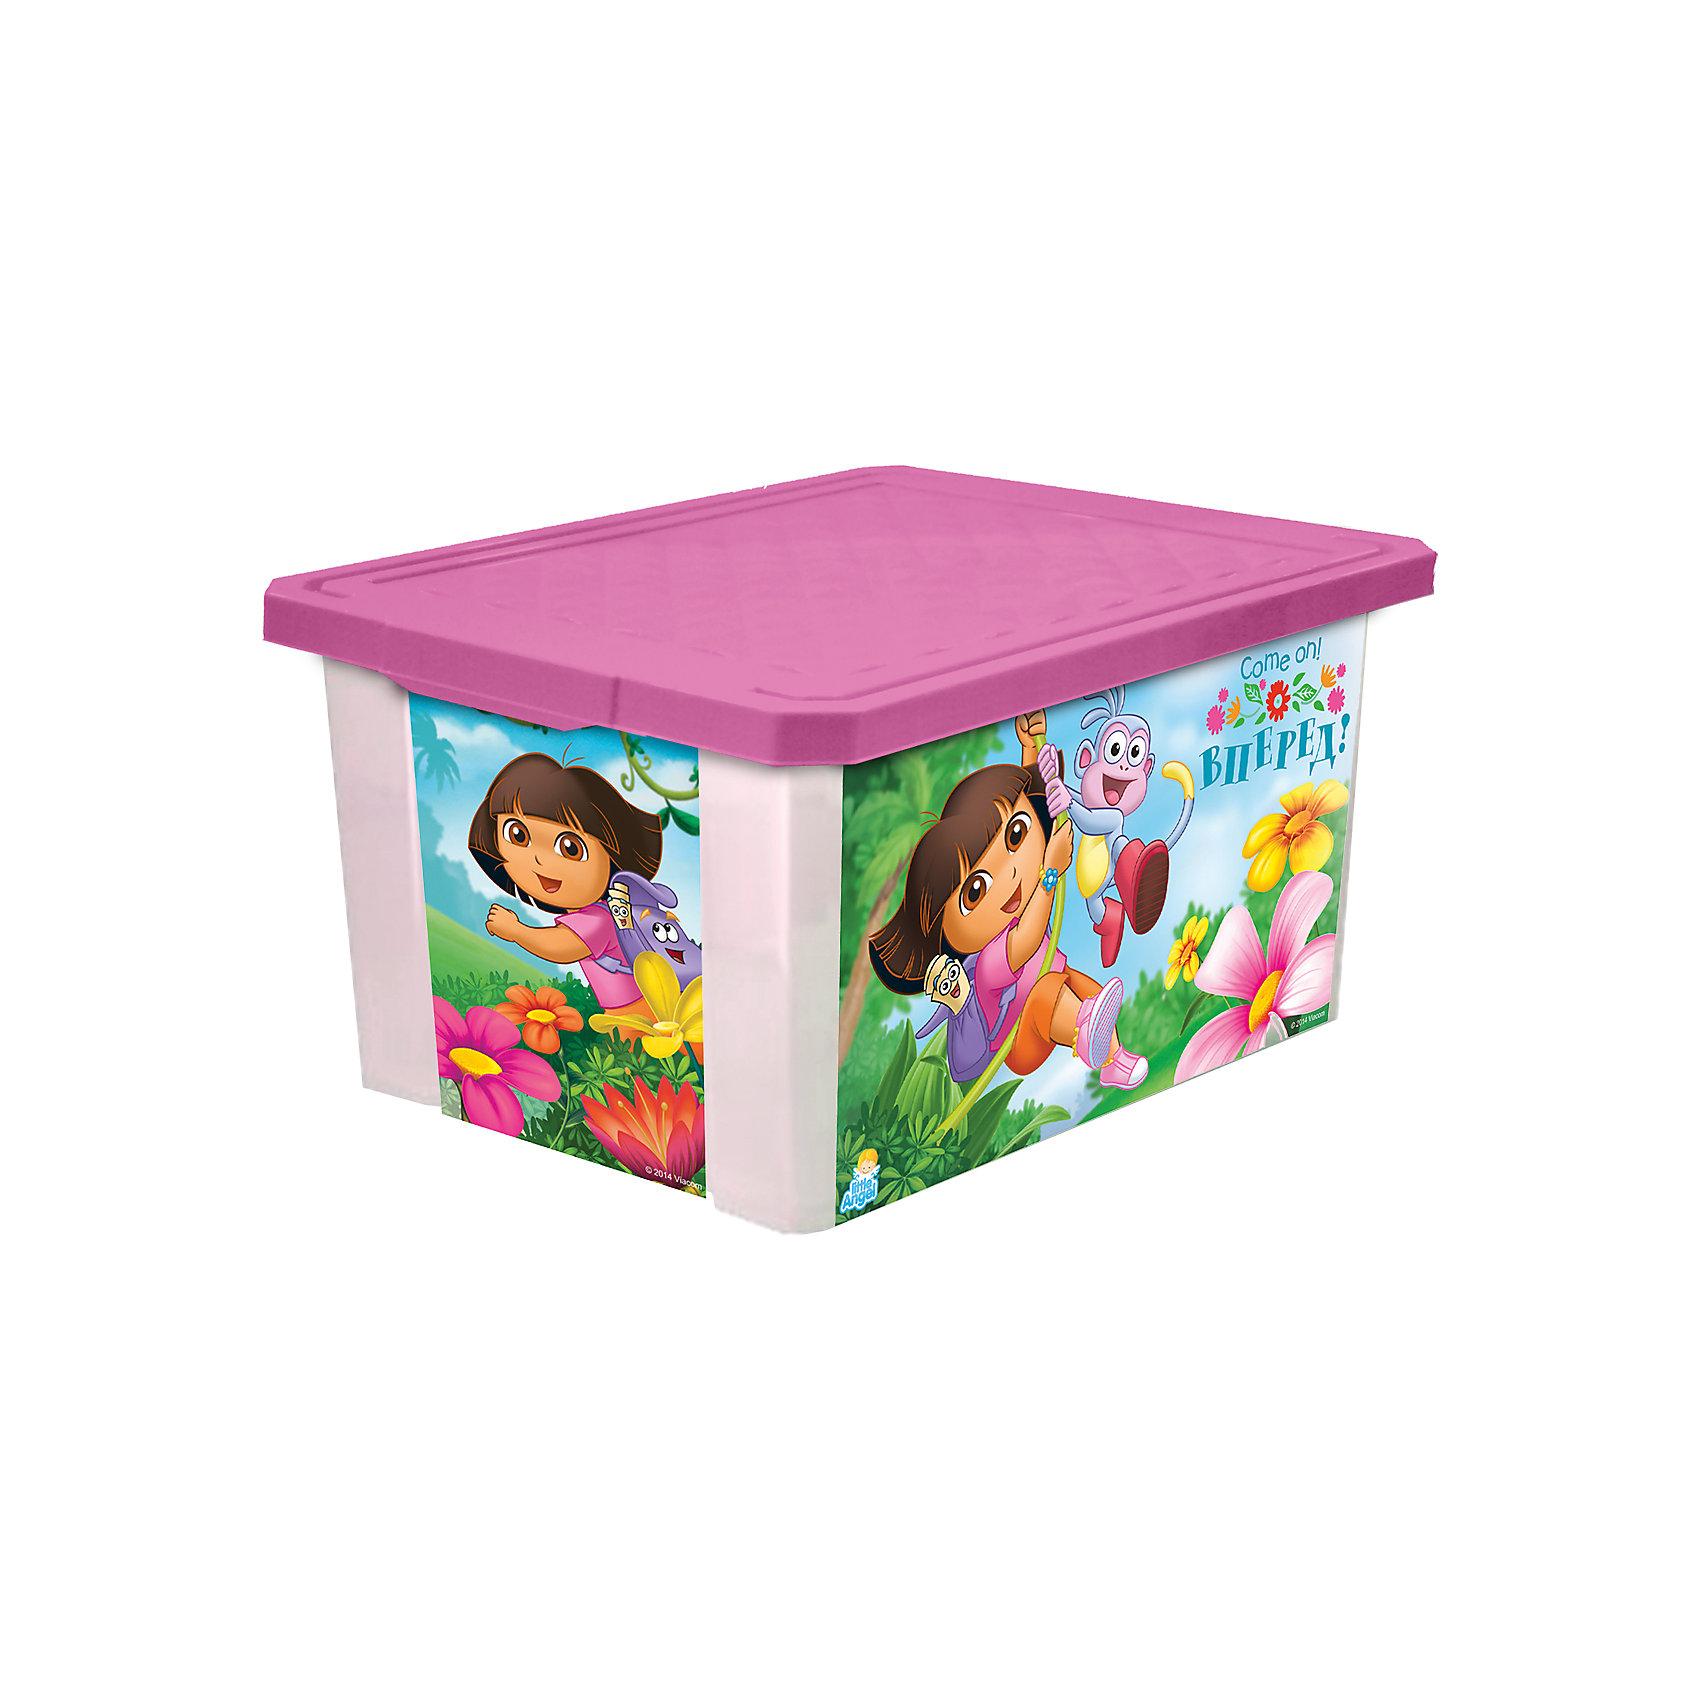 Little Angel Ящик для хранения игрушек X-BOX Даша путешественница 12л, Little Angel, розовый комоды детские little angel комод для комнаты даша путешественница 610мм комбинированный